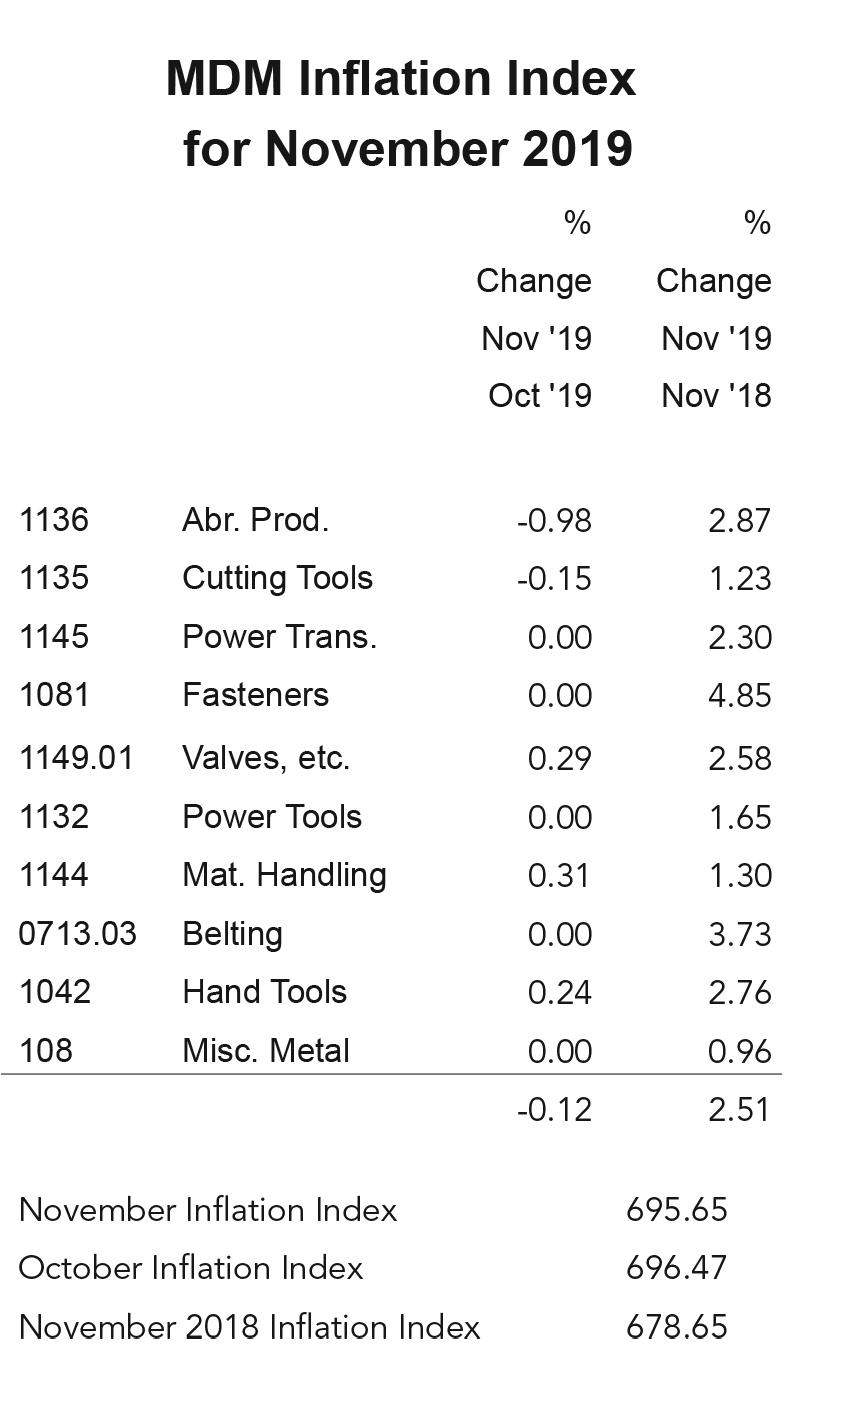 Inflation Index for web